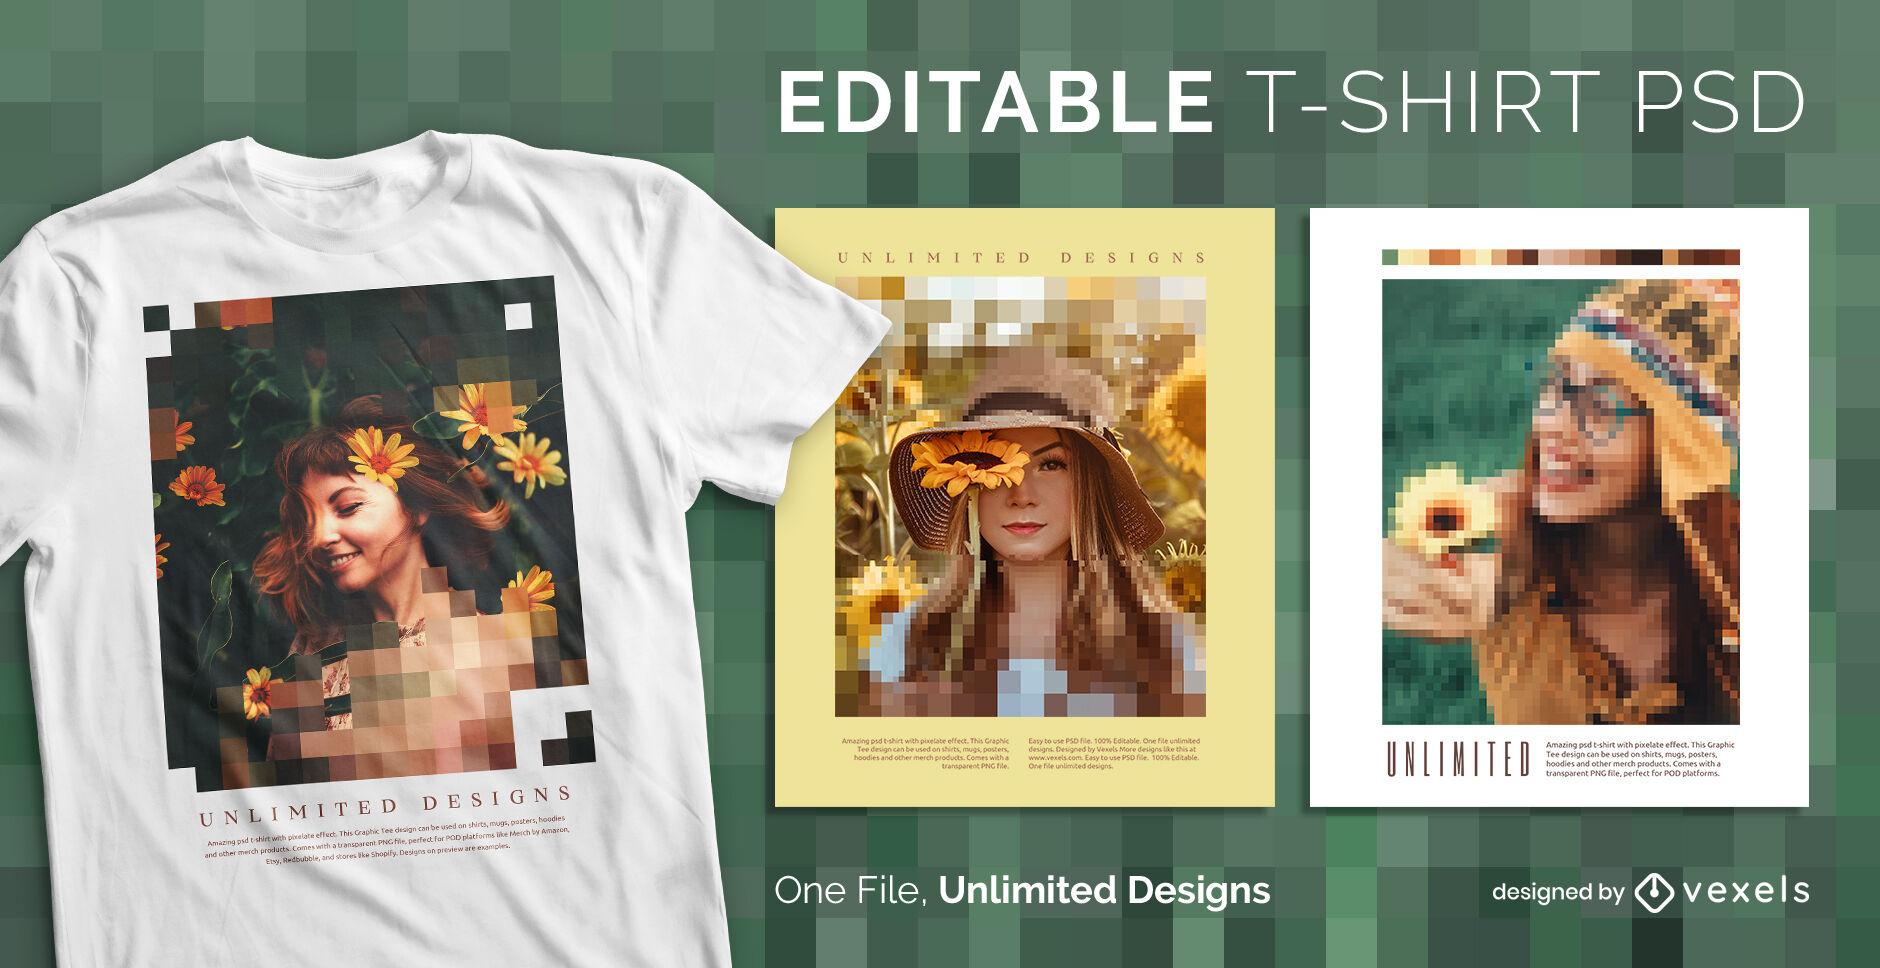 Pixel über Bild editierbares PSD-T-Shirt